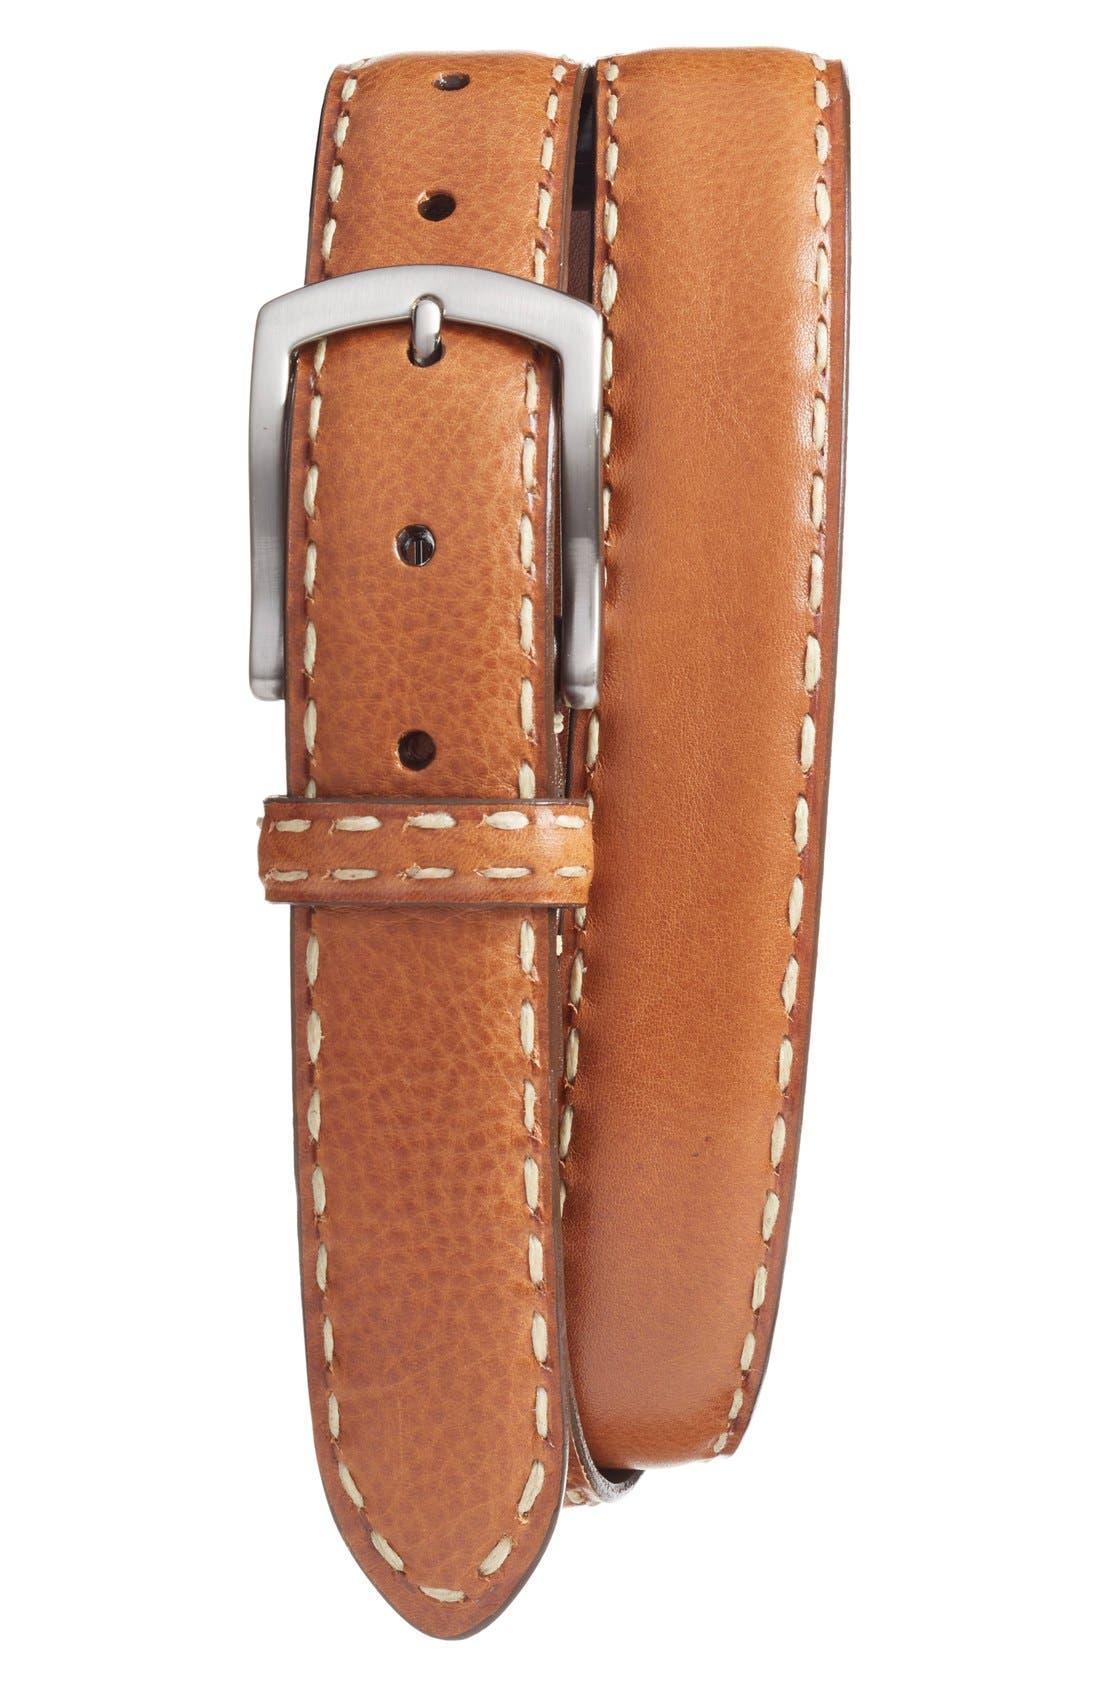 Main Image - Torino Belts Calfskin Leather Belt